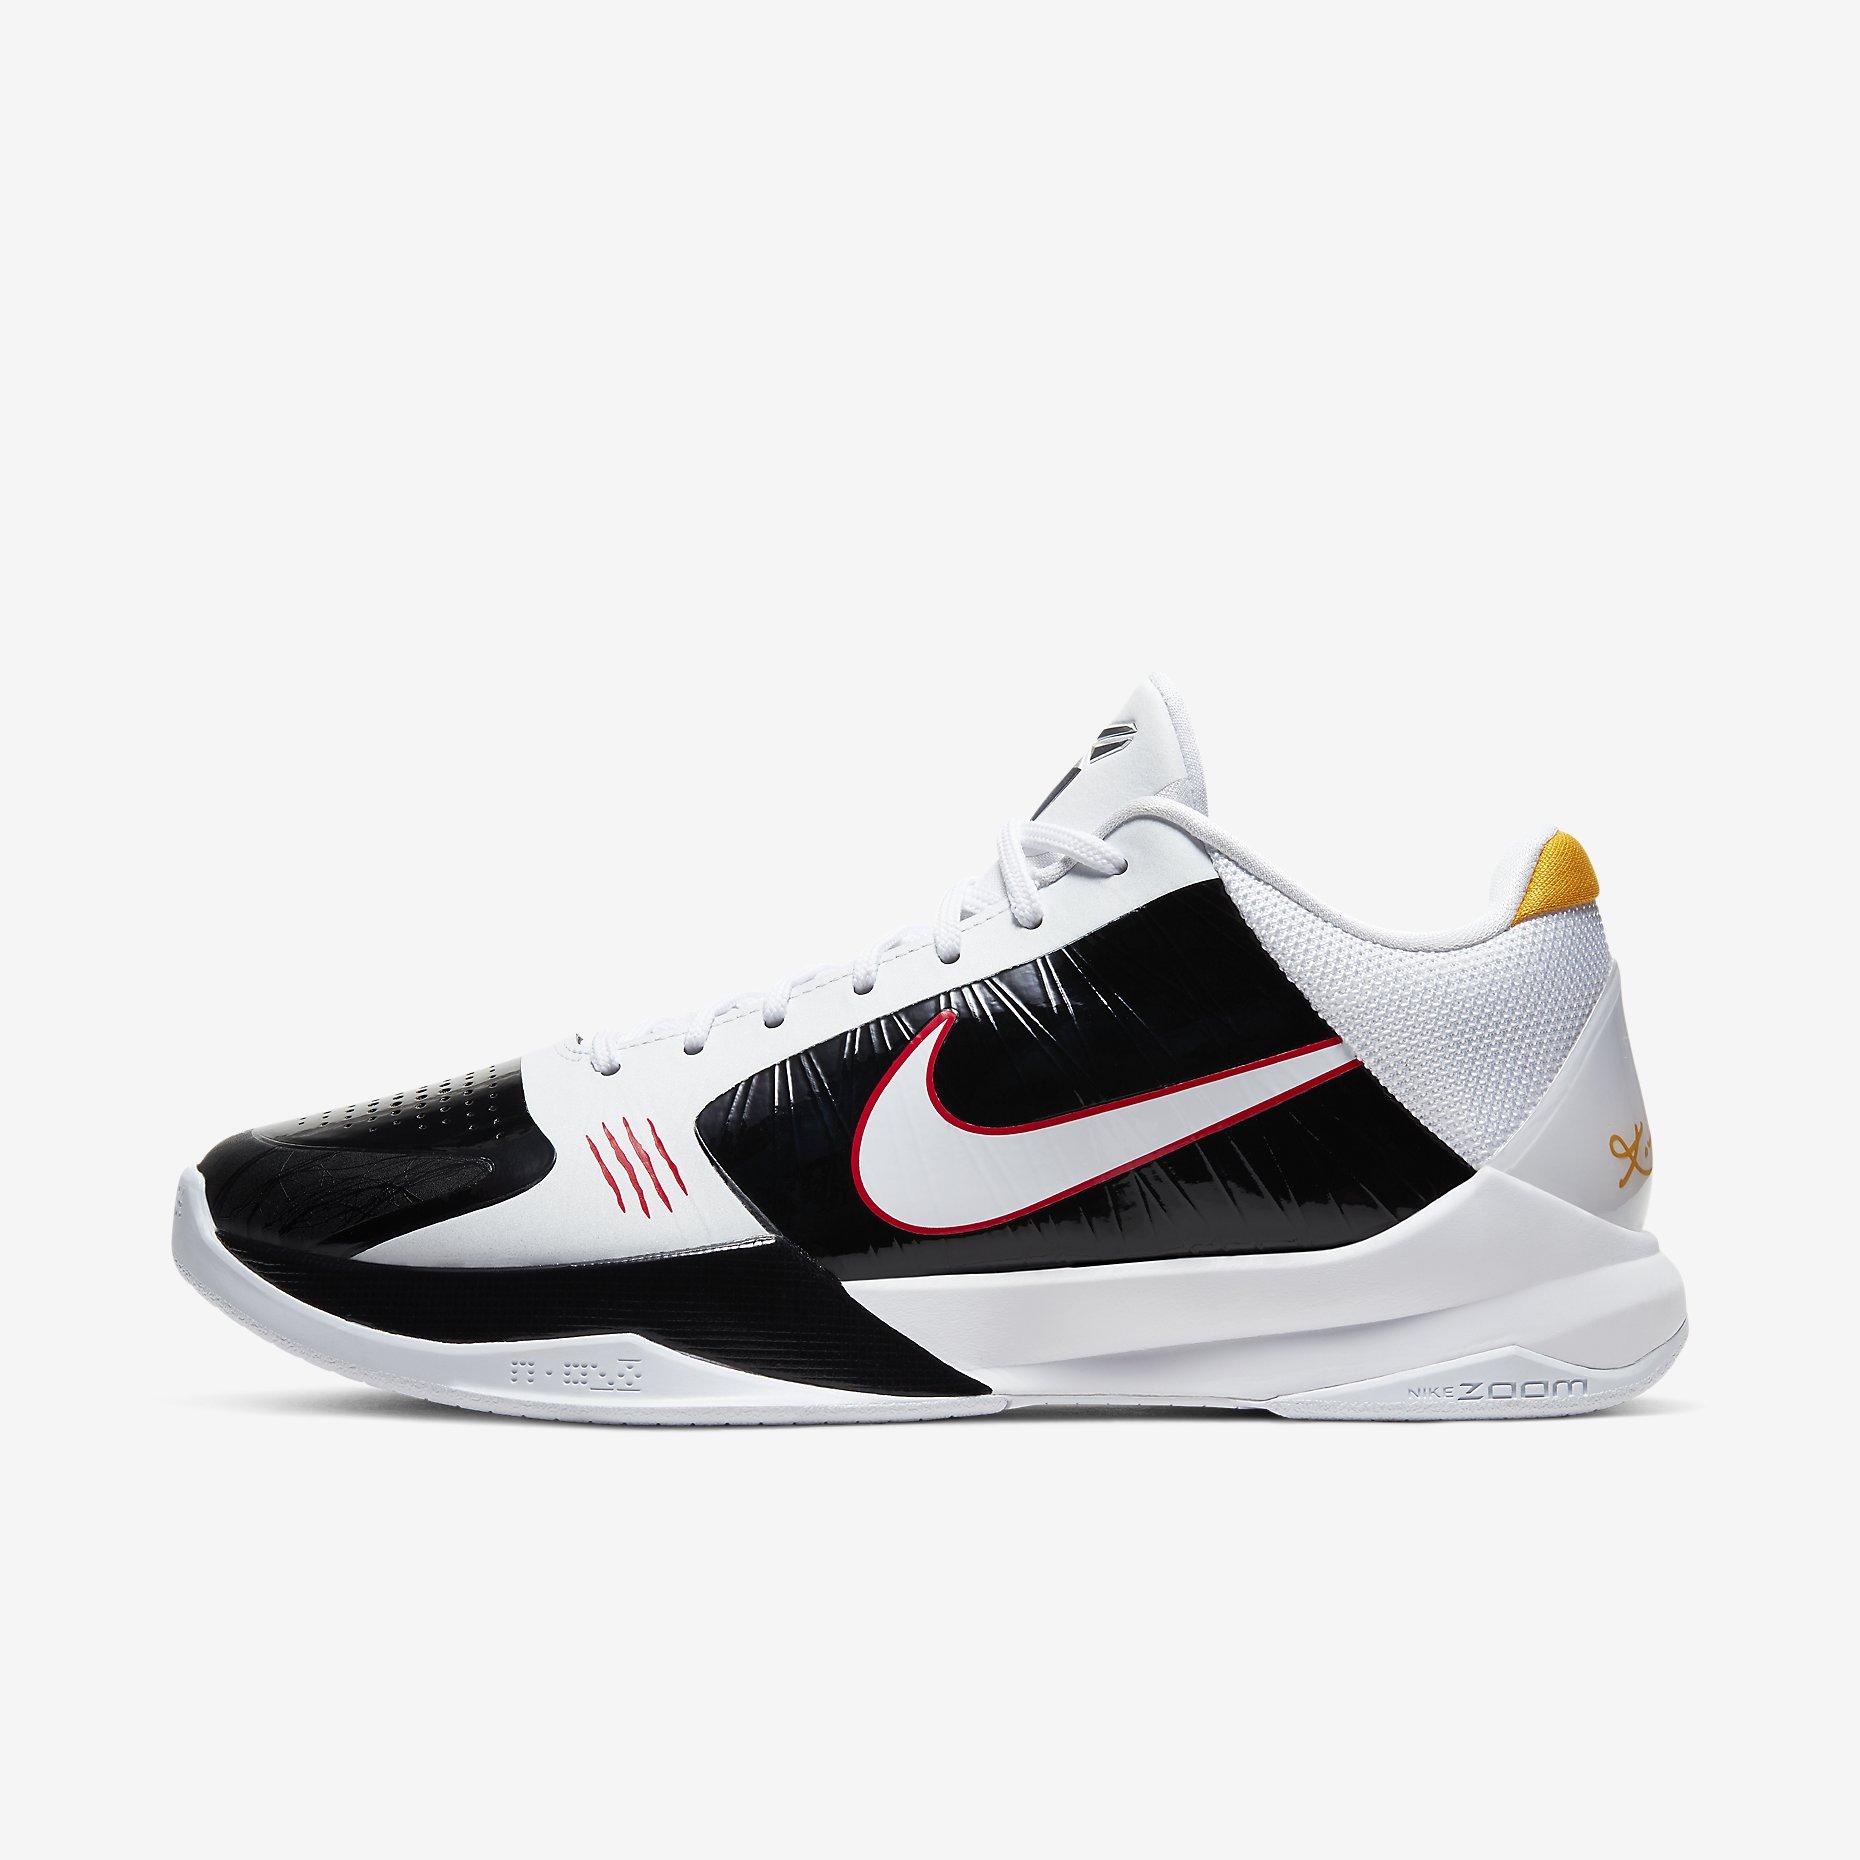 Nike Kobe 5 Protro 'Bruce Lee Alt'}